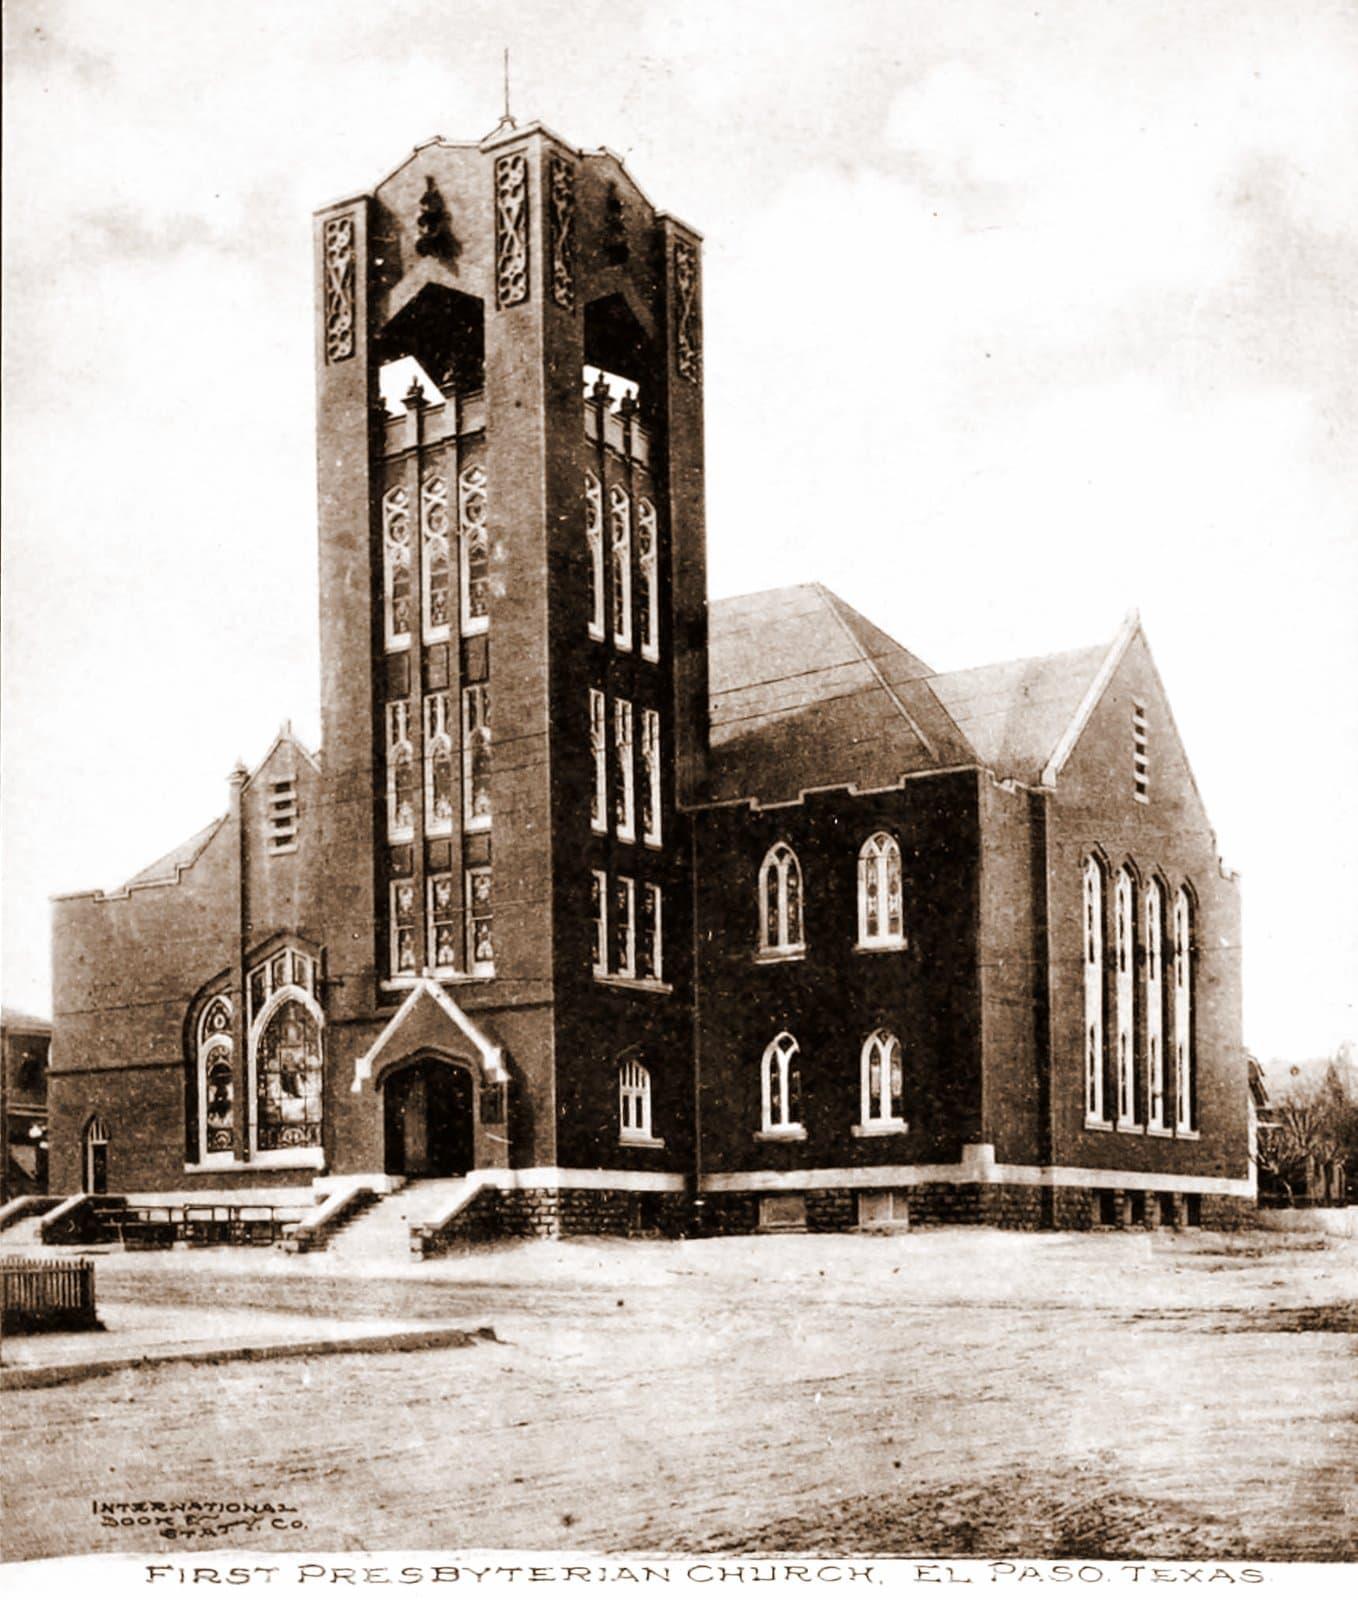 First Presbyterian Church in El Paso, Texas (1910)